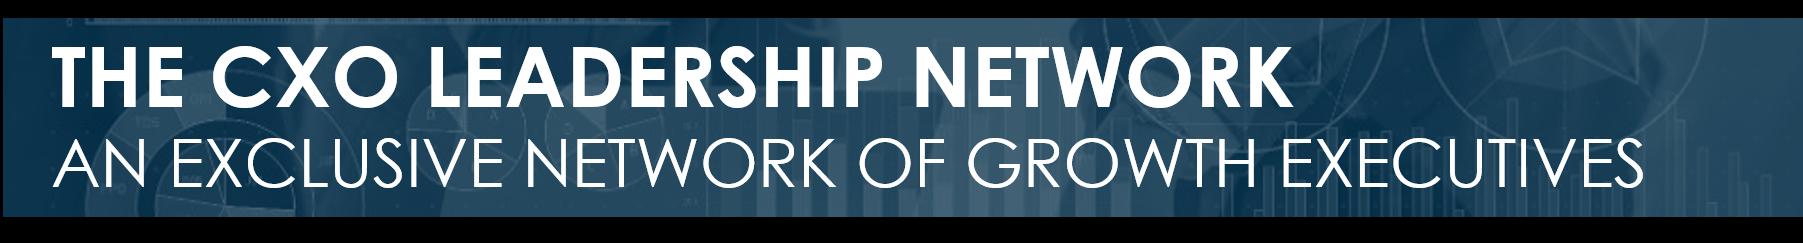 THE CXO LEADESHIIP NETWORK